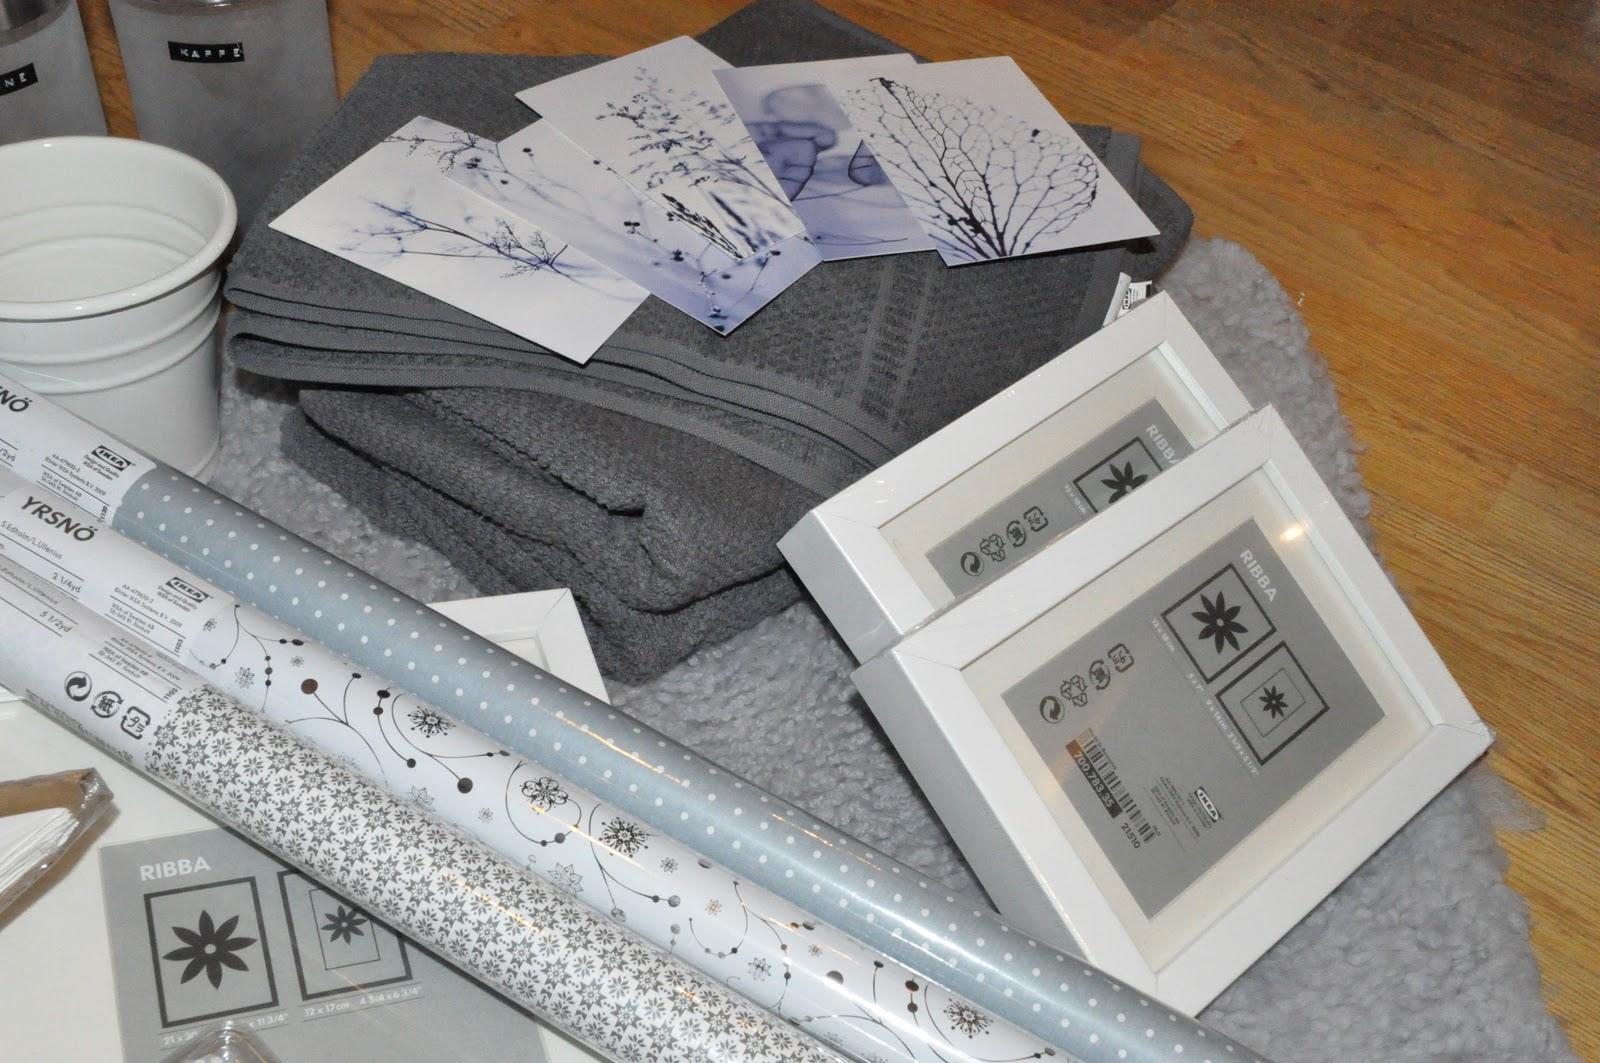 nordisk interi r inspirasjon ikea stoff og stil. Black Bedroom Furniture Sets. Home Design Ideas